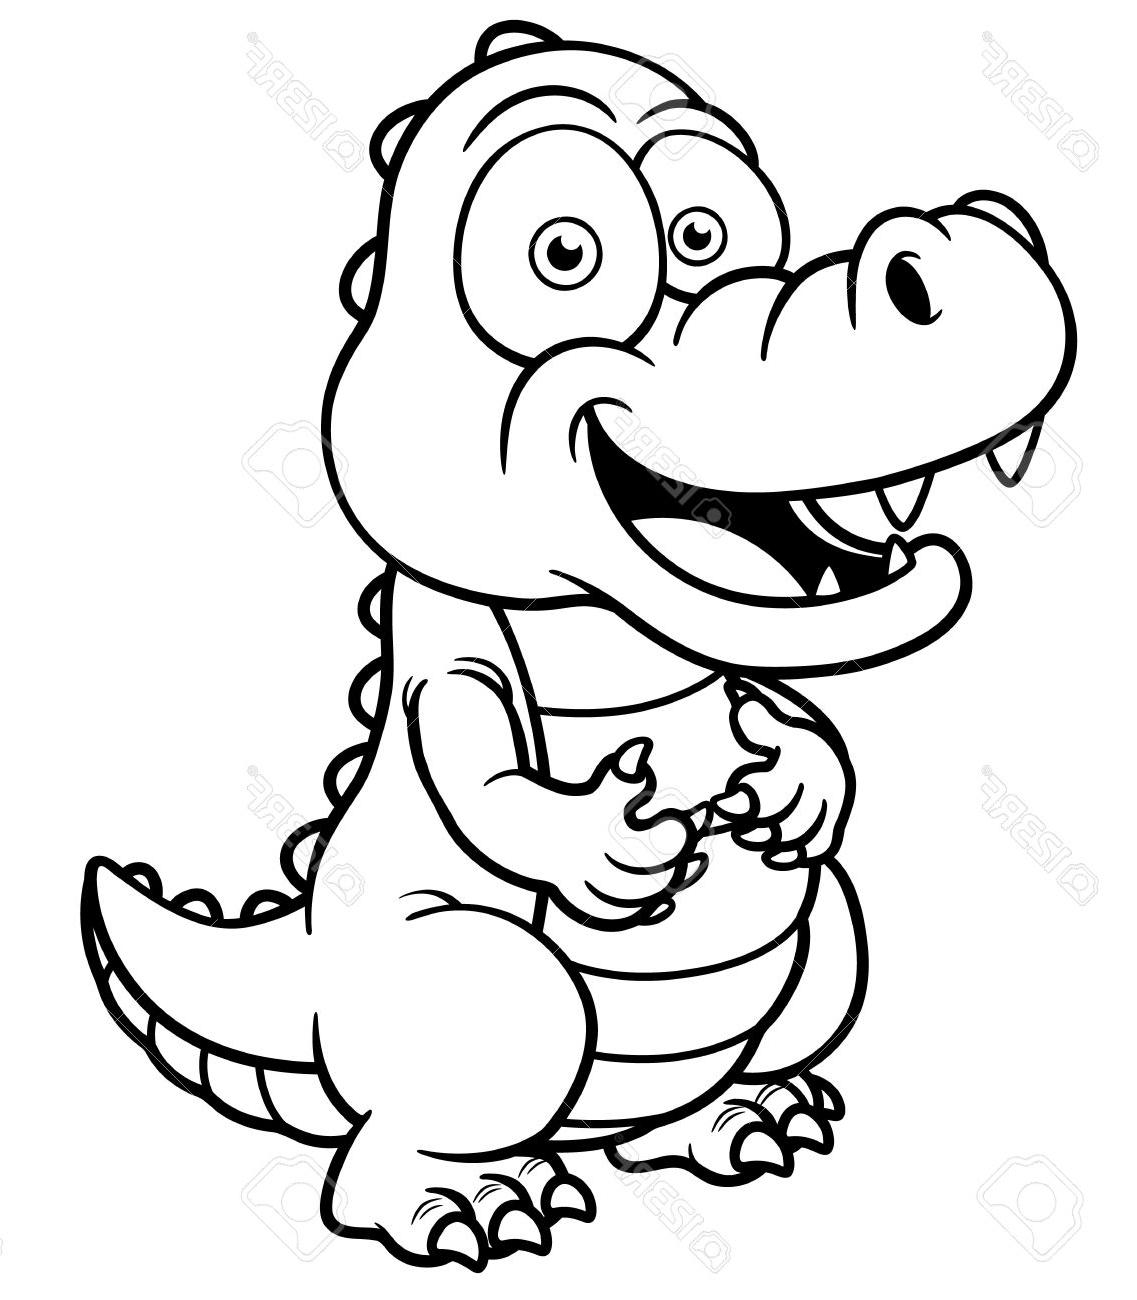 1137x1300 Crocodile How To Draw A Crocodile Cartoon Easy Sketch Drawing